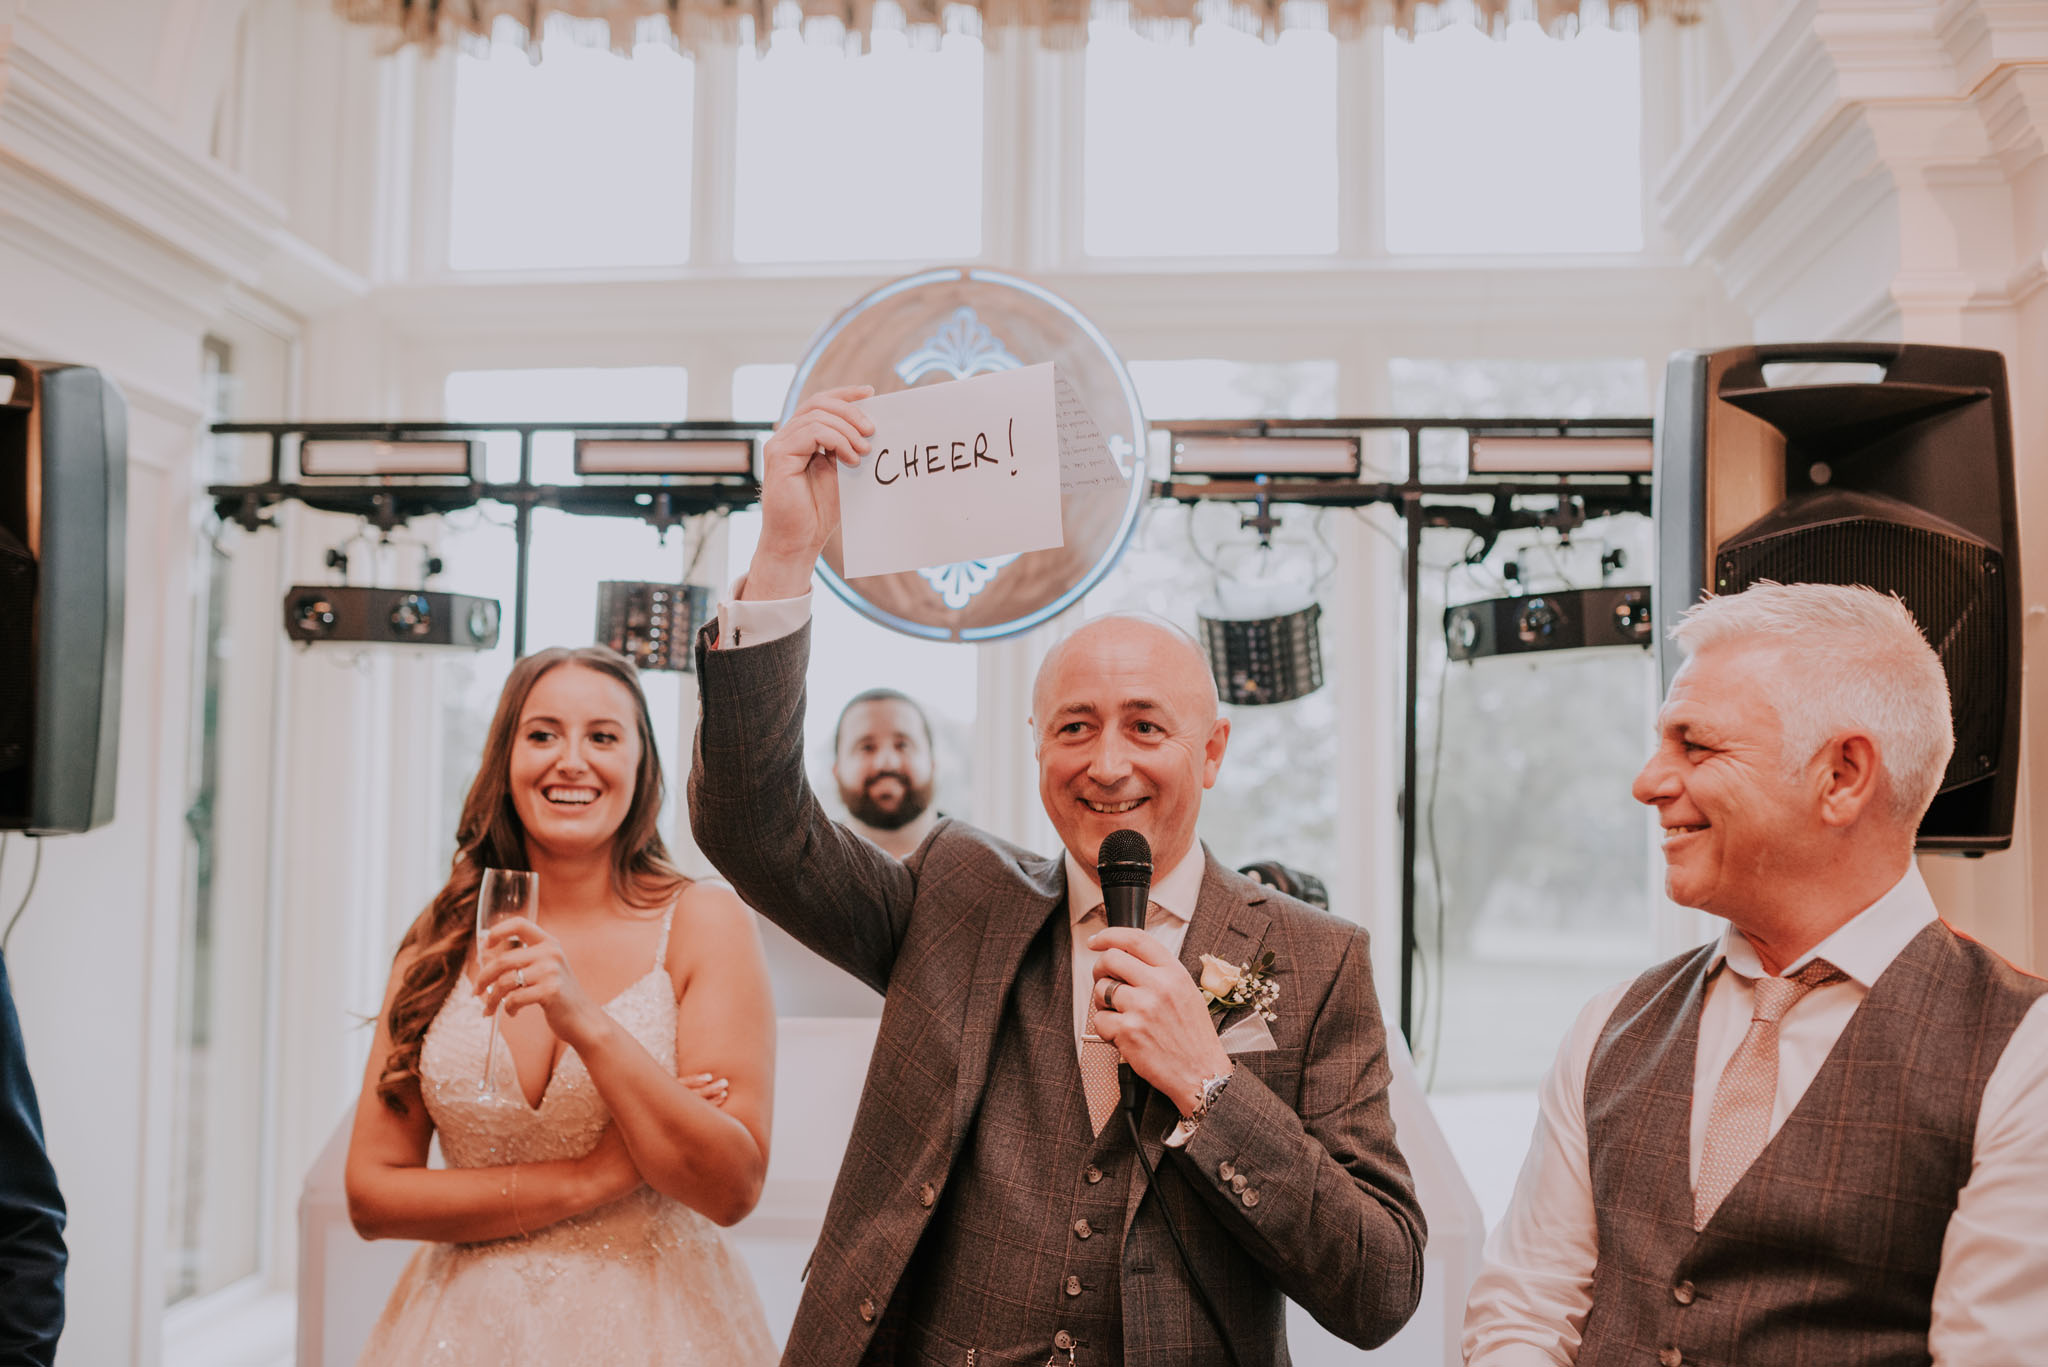 wedding-photographer-glewstone-court-hereford-scott-stockwell-photography413.jpg